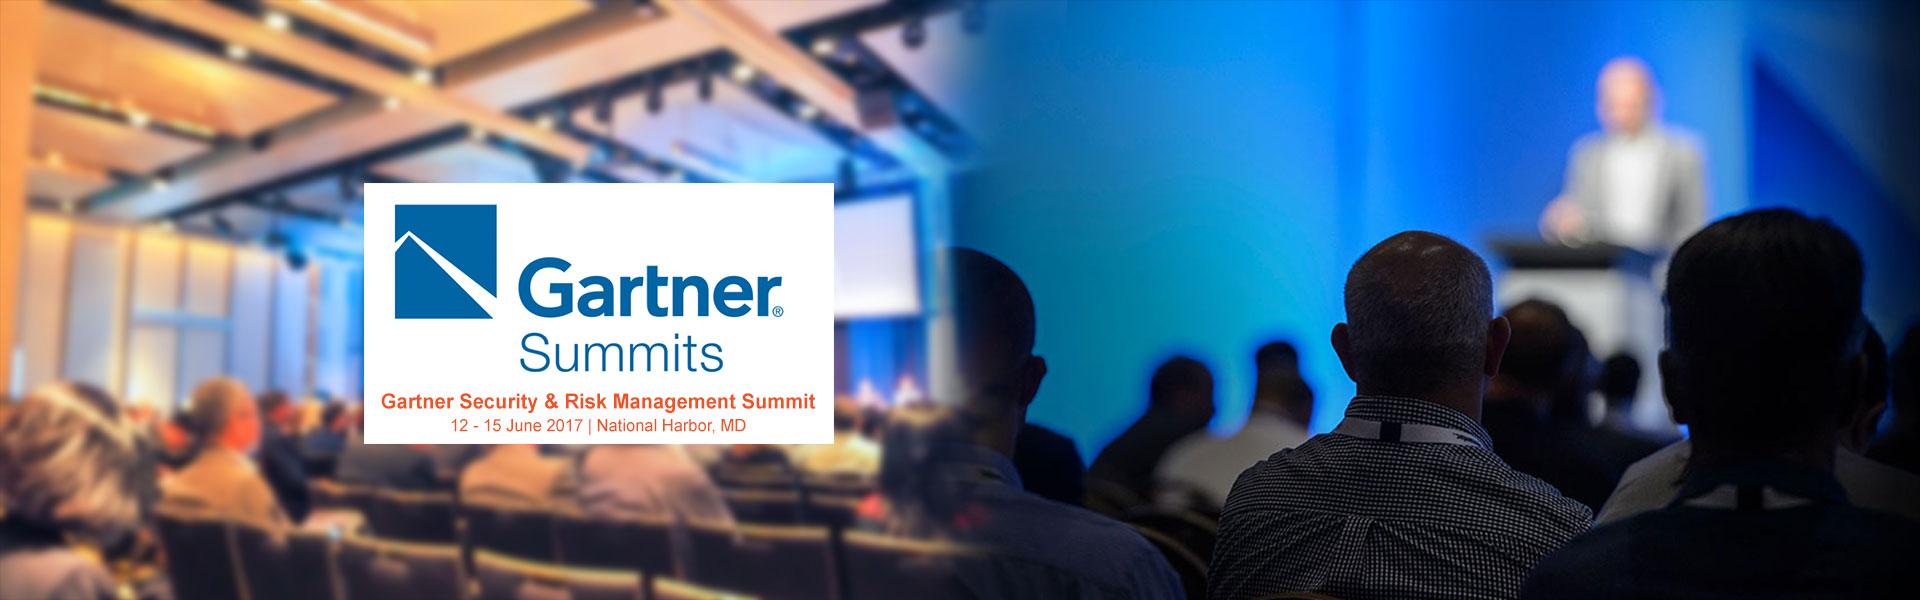 Gartner-Summit2017